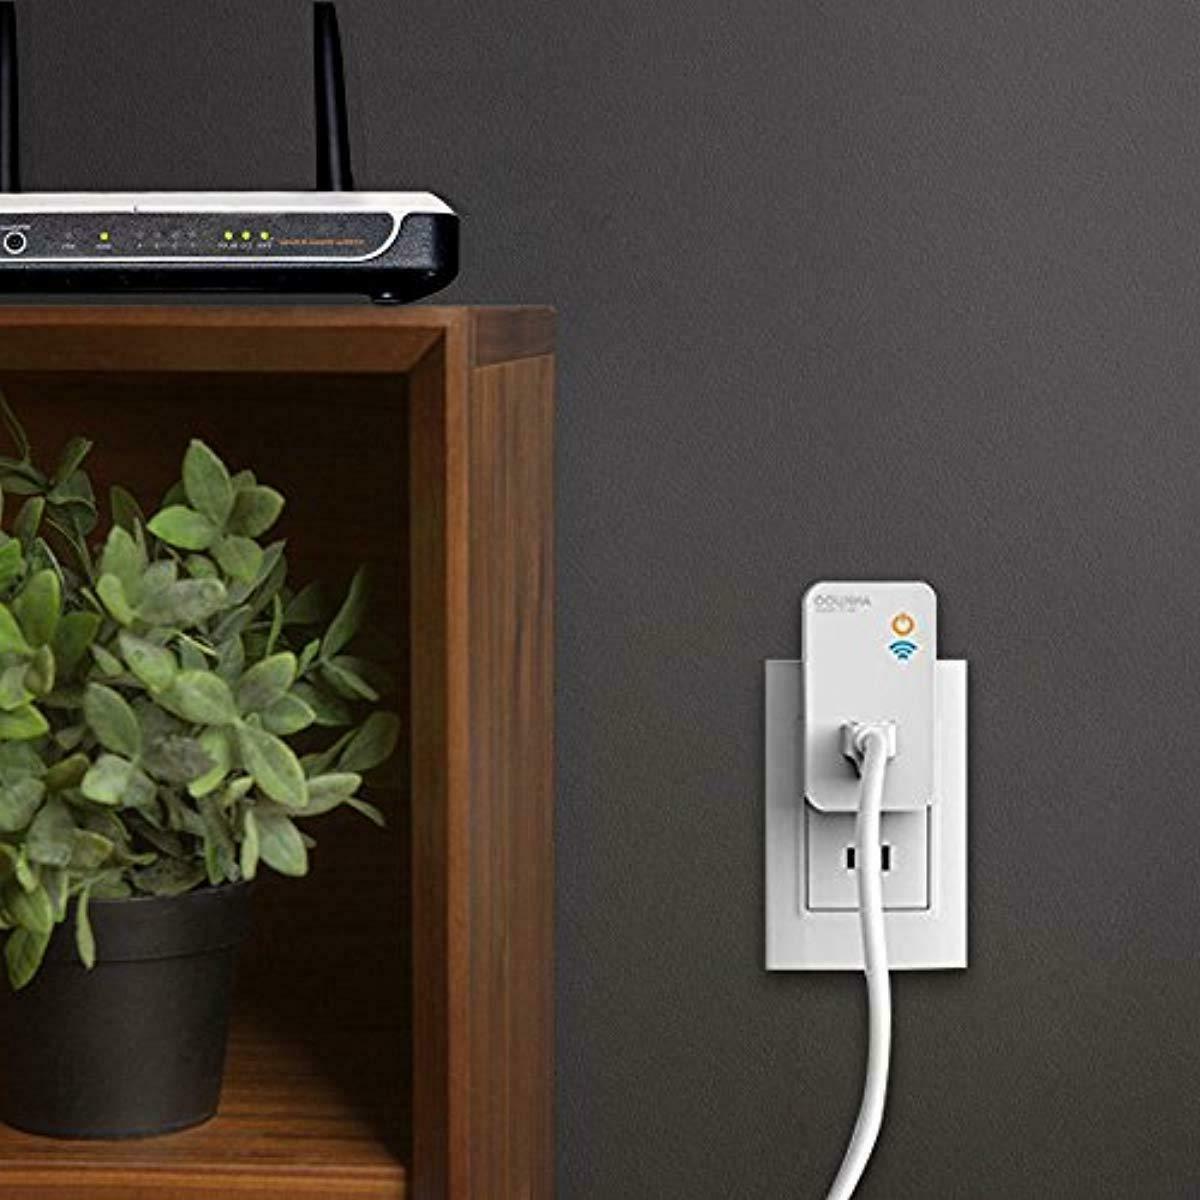 Ankuoo Plug WiFiRestart and Monitor/Modem/Access